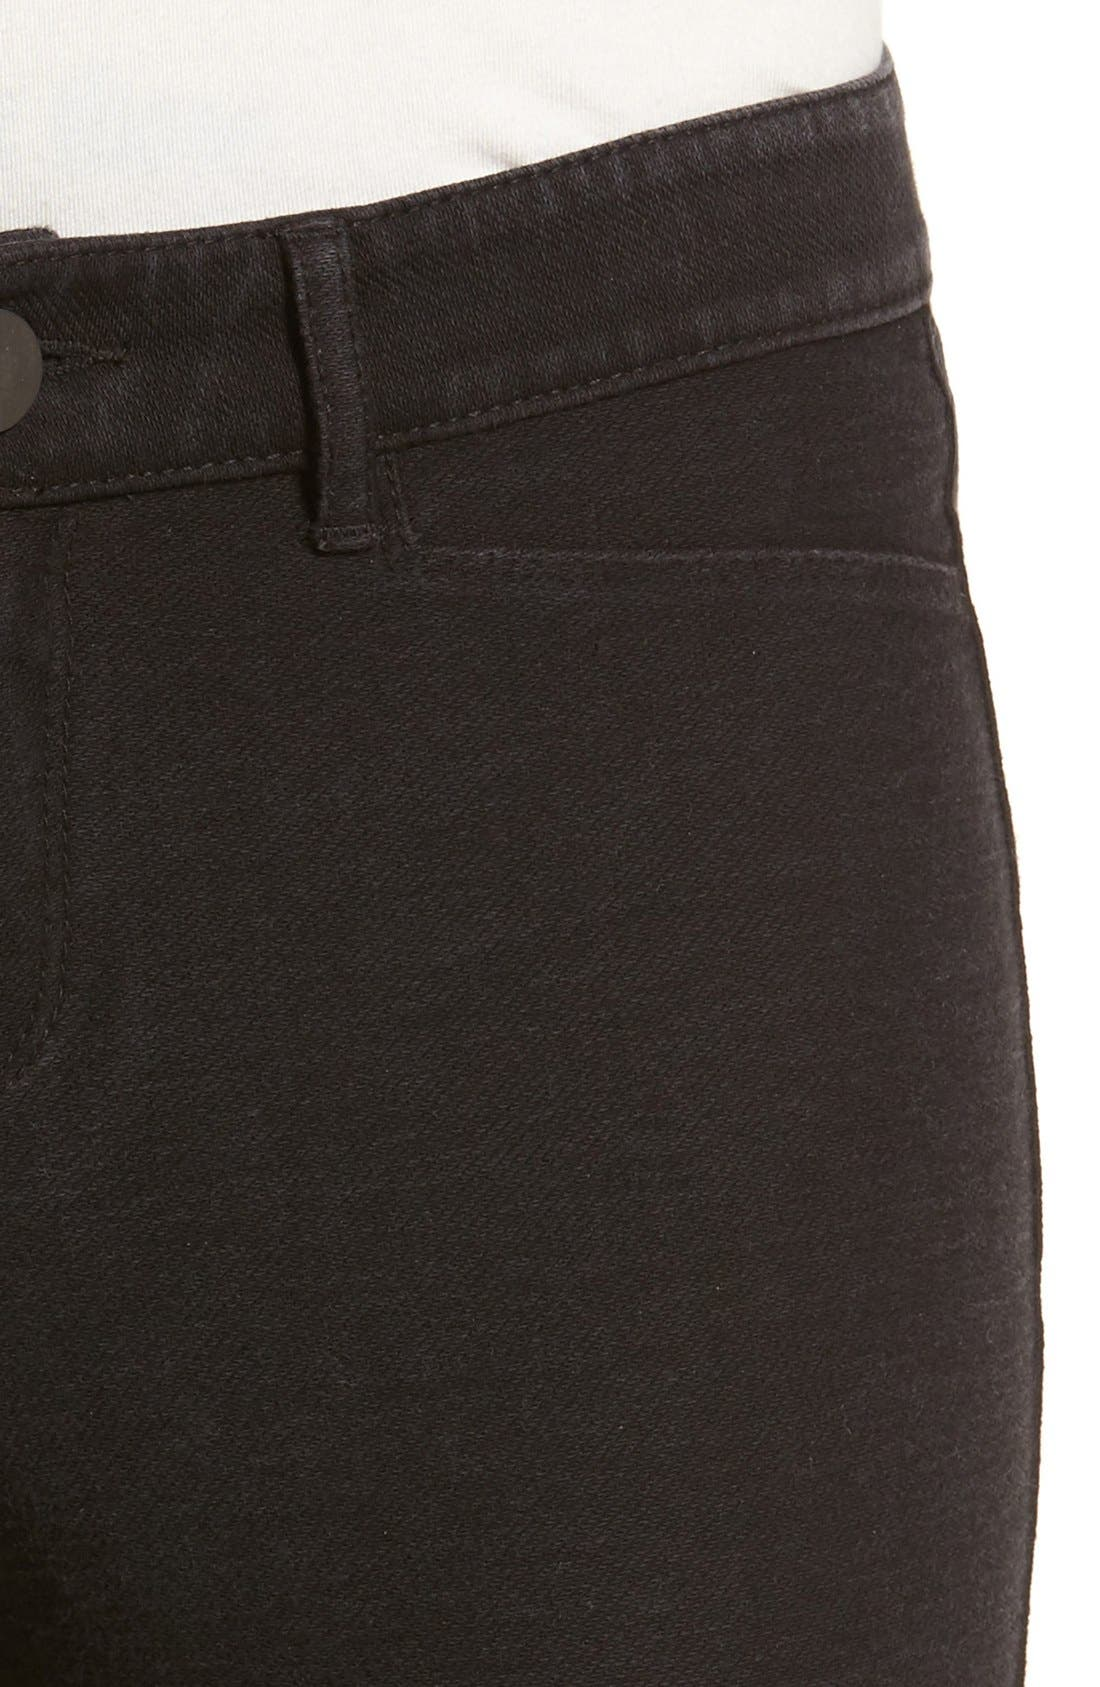 Denim Knit Skinny Jeans,                             Alternate thumbnail 3, color,                             002